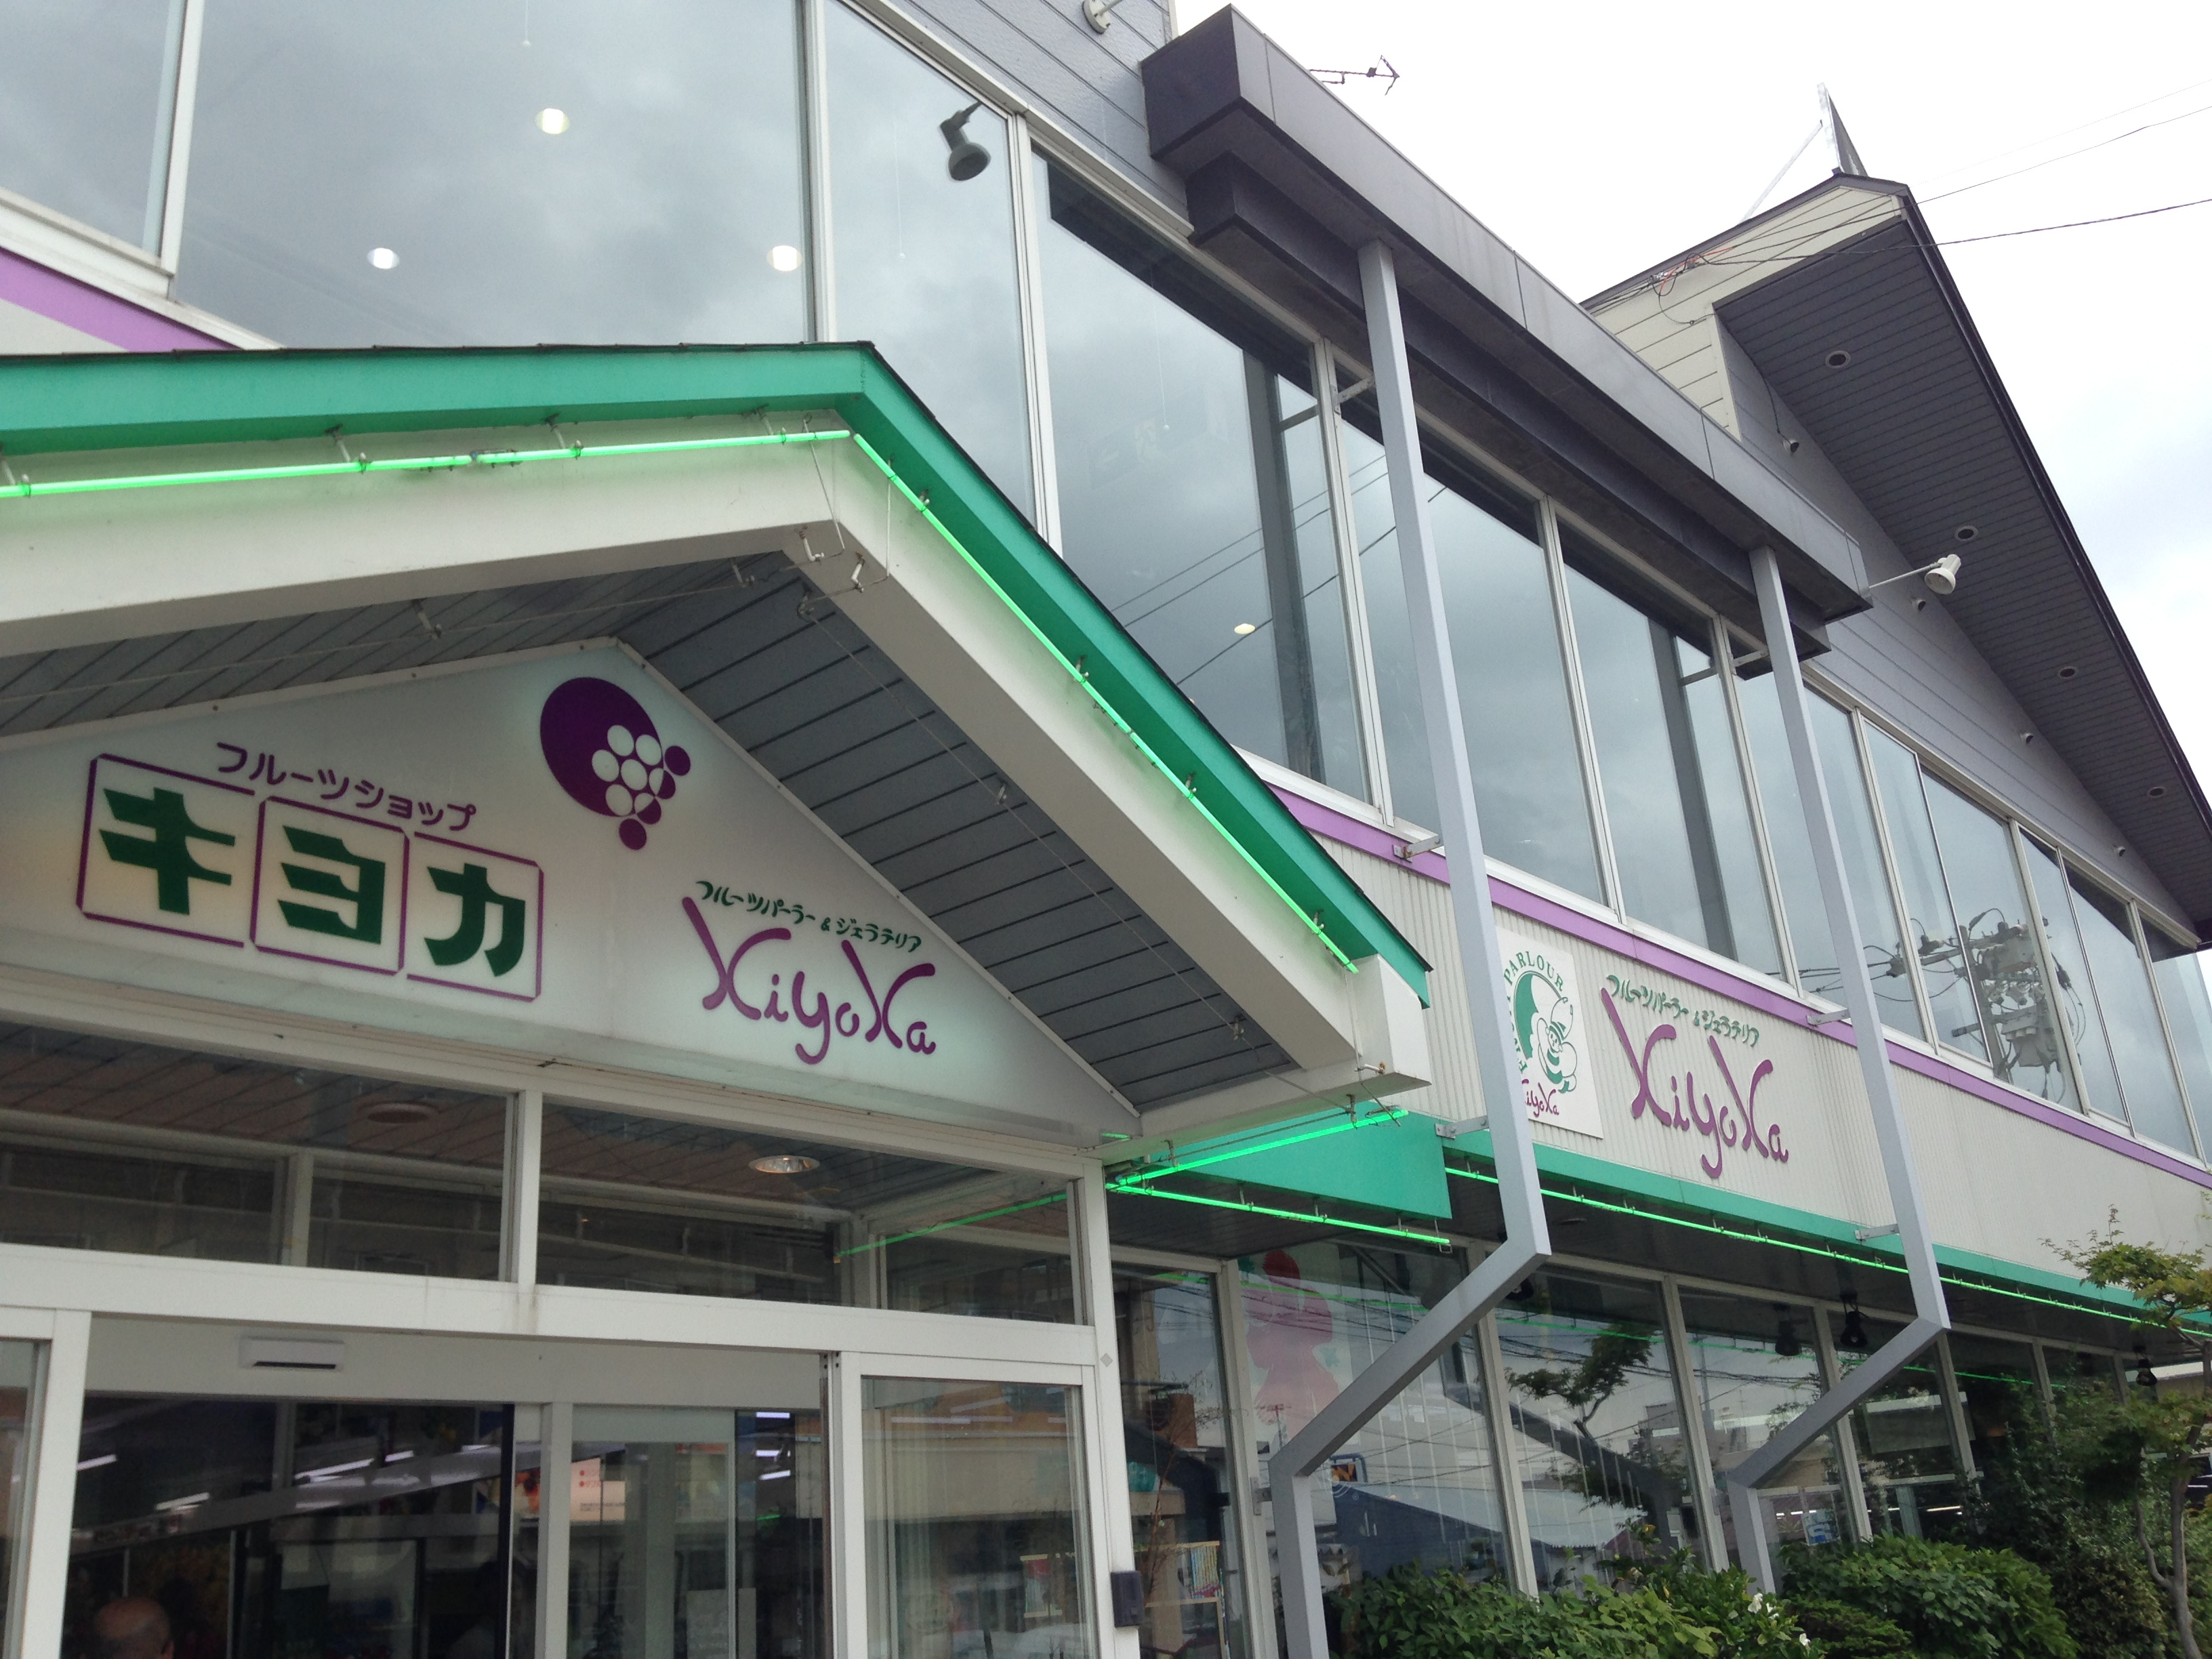 KIYOKO水果店的外观。